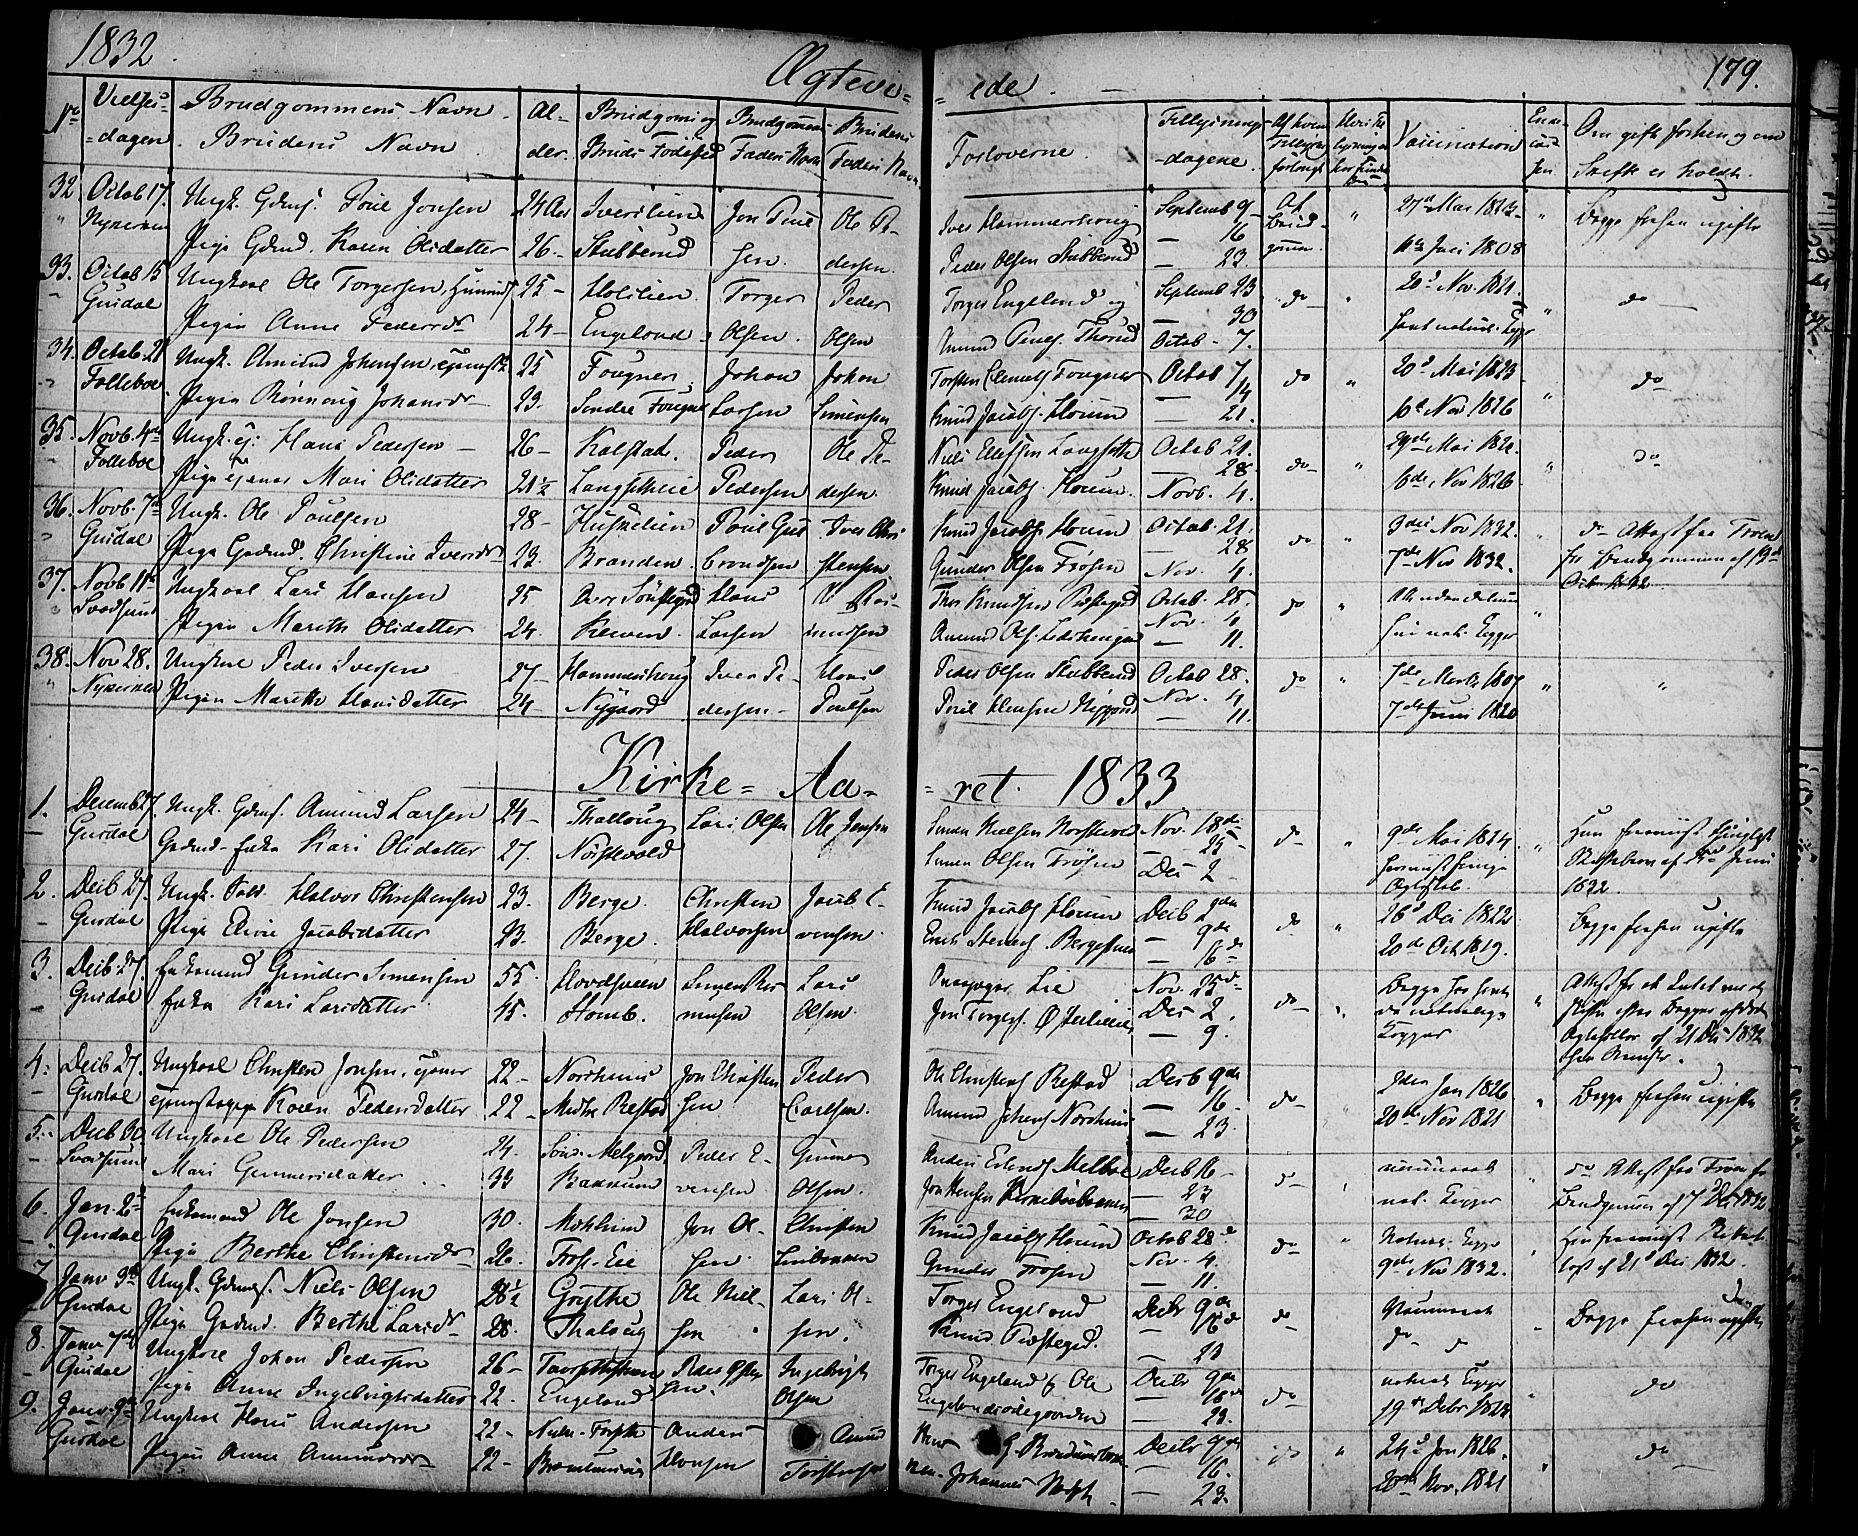 SAH, Gausdal prestekontor, Ministerialbok nr. 6, 1830-1839, s. 179